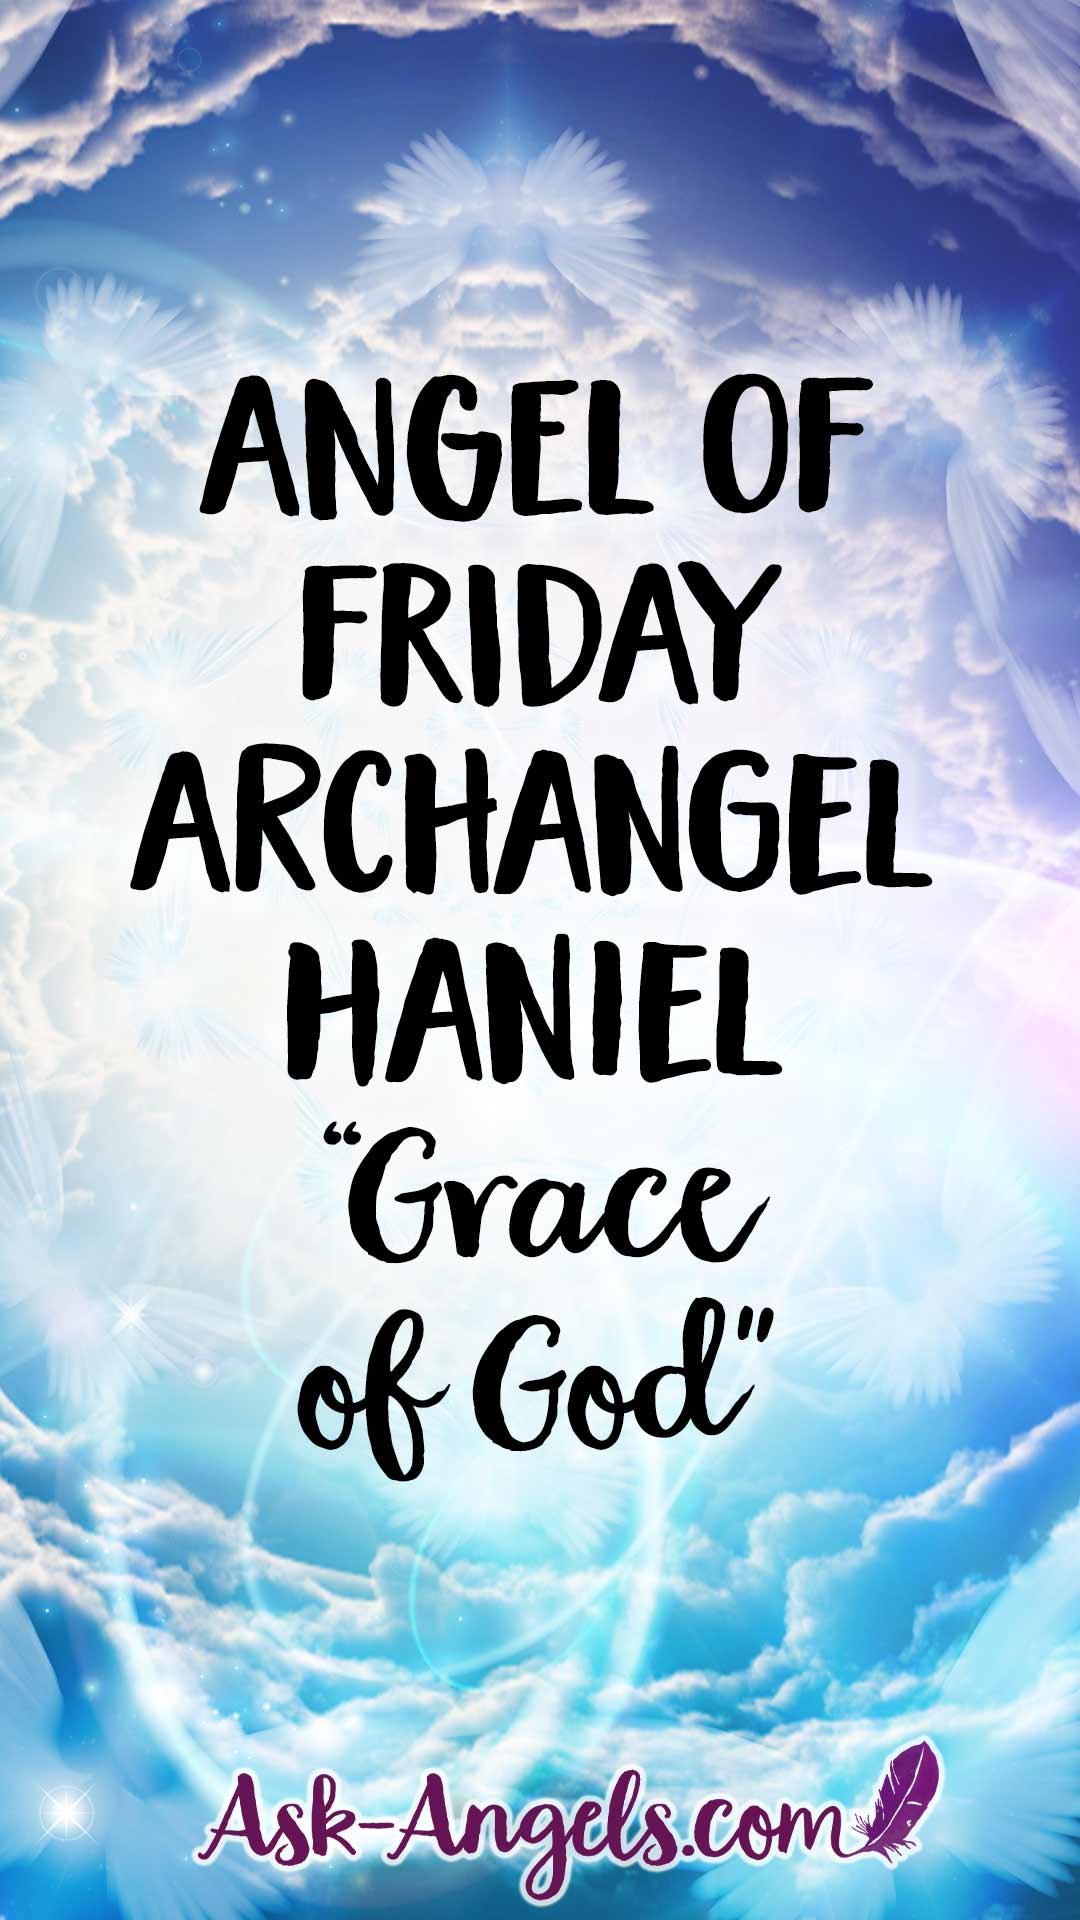 Archangel of Friday: Archangel Anael or Archangel Haniel- Haniel means Grace of God